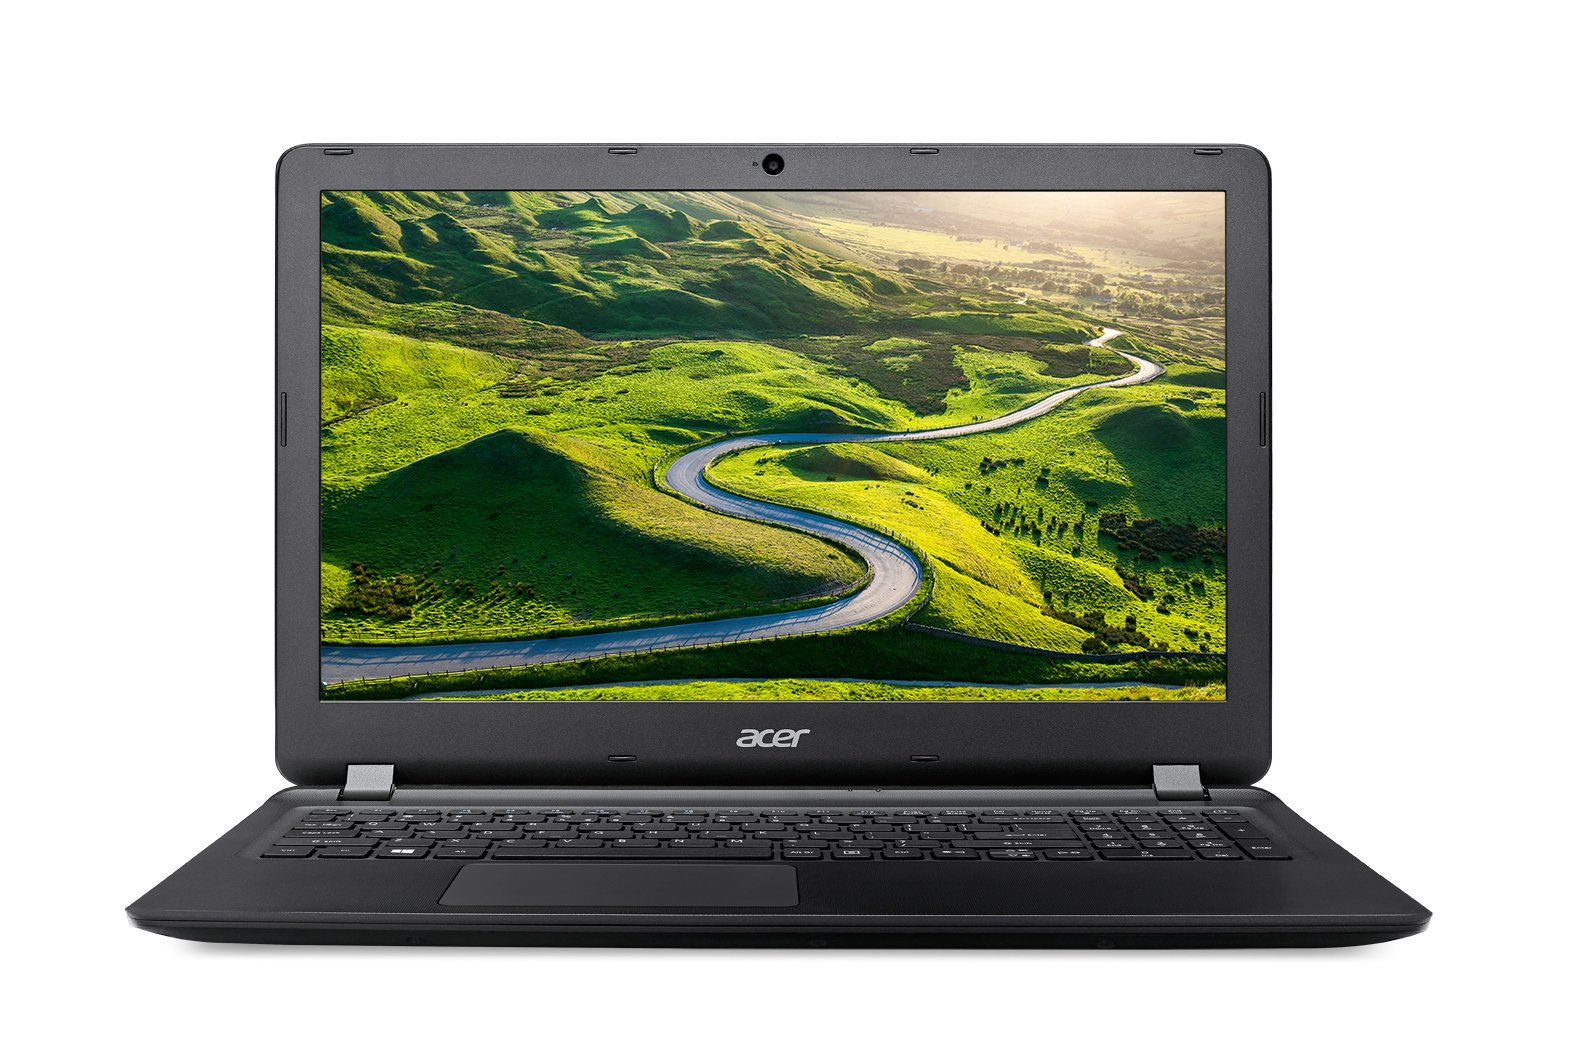 "Acer Aspire ES 15 (ES1-533-P5M9) Pentium N4200/4 GB+N/A/128 GB SSD+N/DVDRW/HD Graphics /15.6"" FHD LED matný/W10 H/Black"